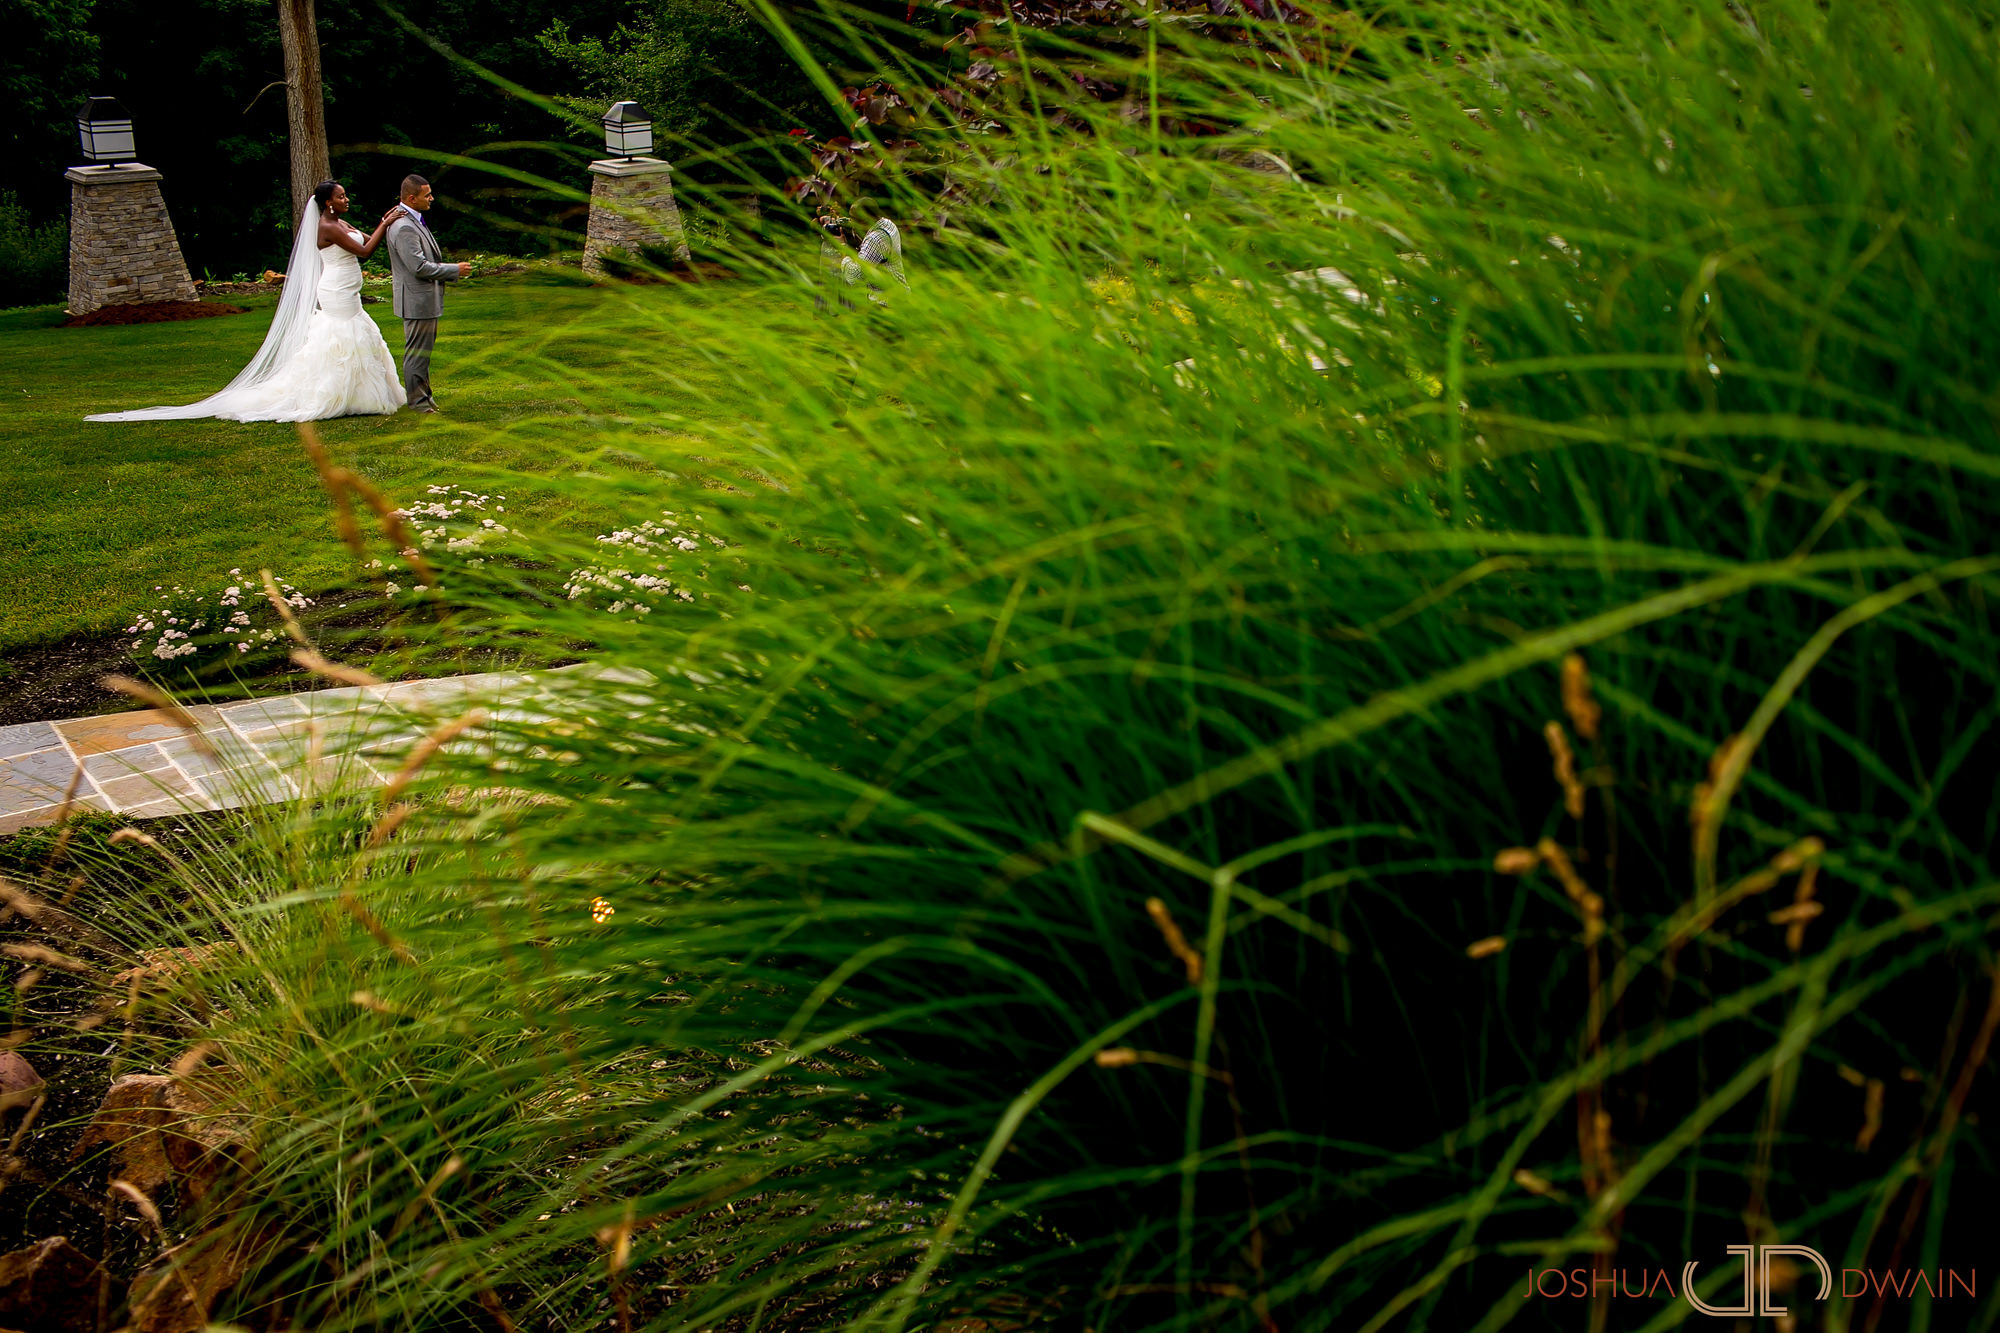 anna-edwin-012-stone-house-warren-new-jersey-wedding-photographer-joshua-dwain